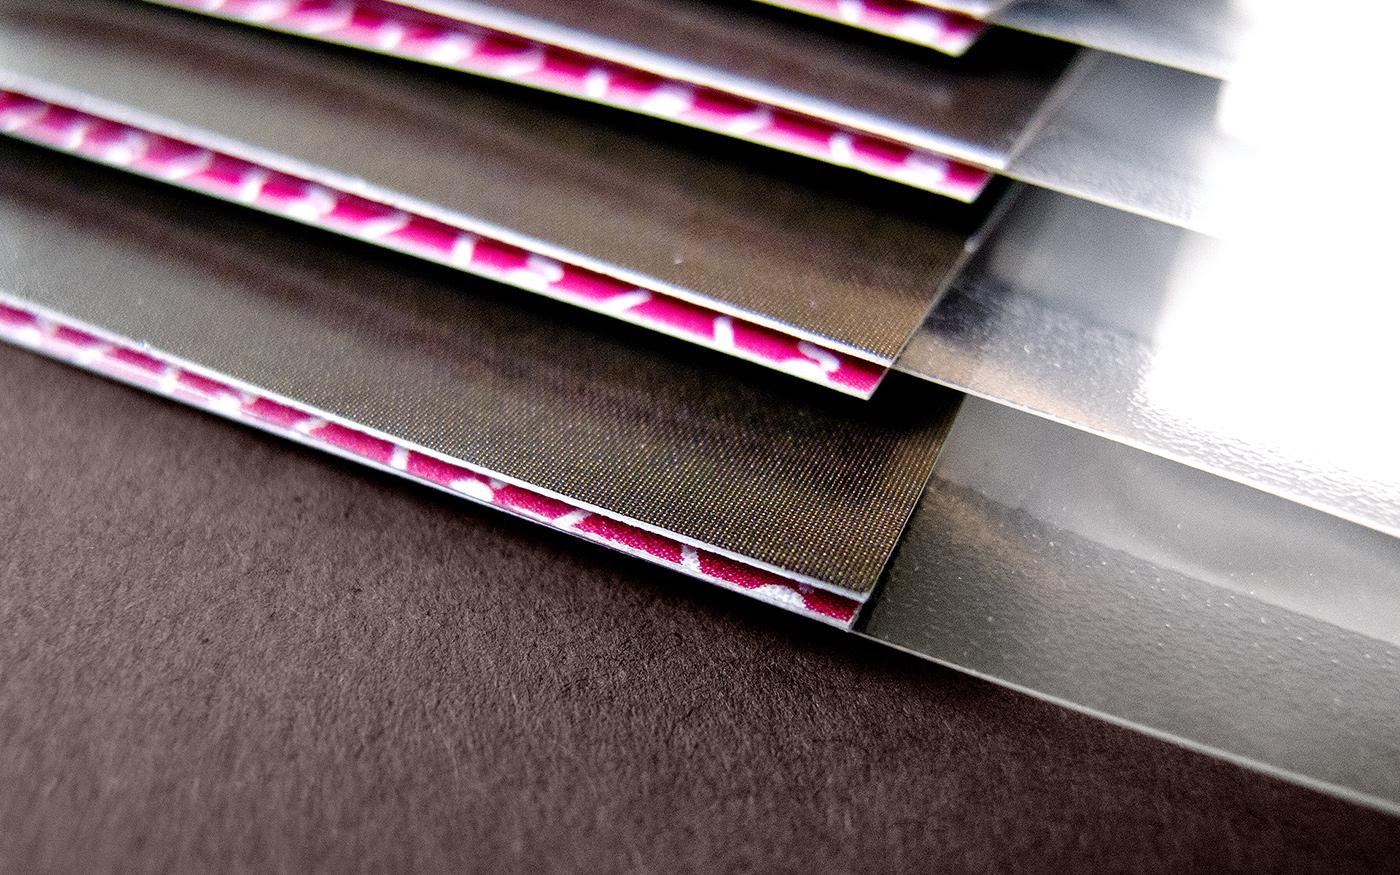 edible design spot colours silkscreen flowpacks